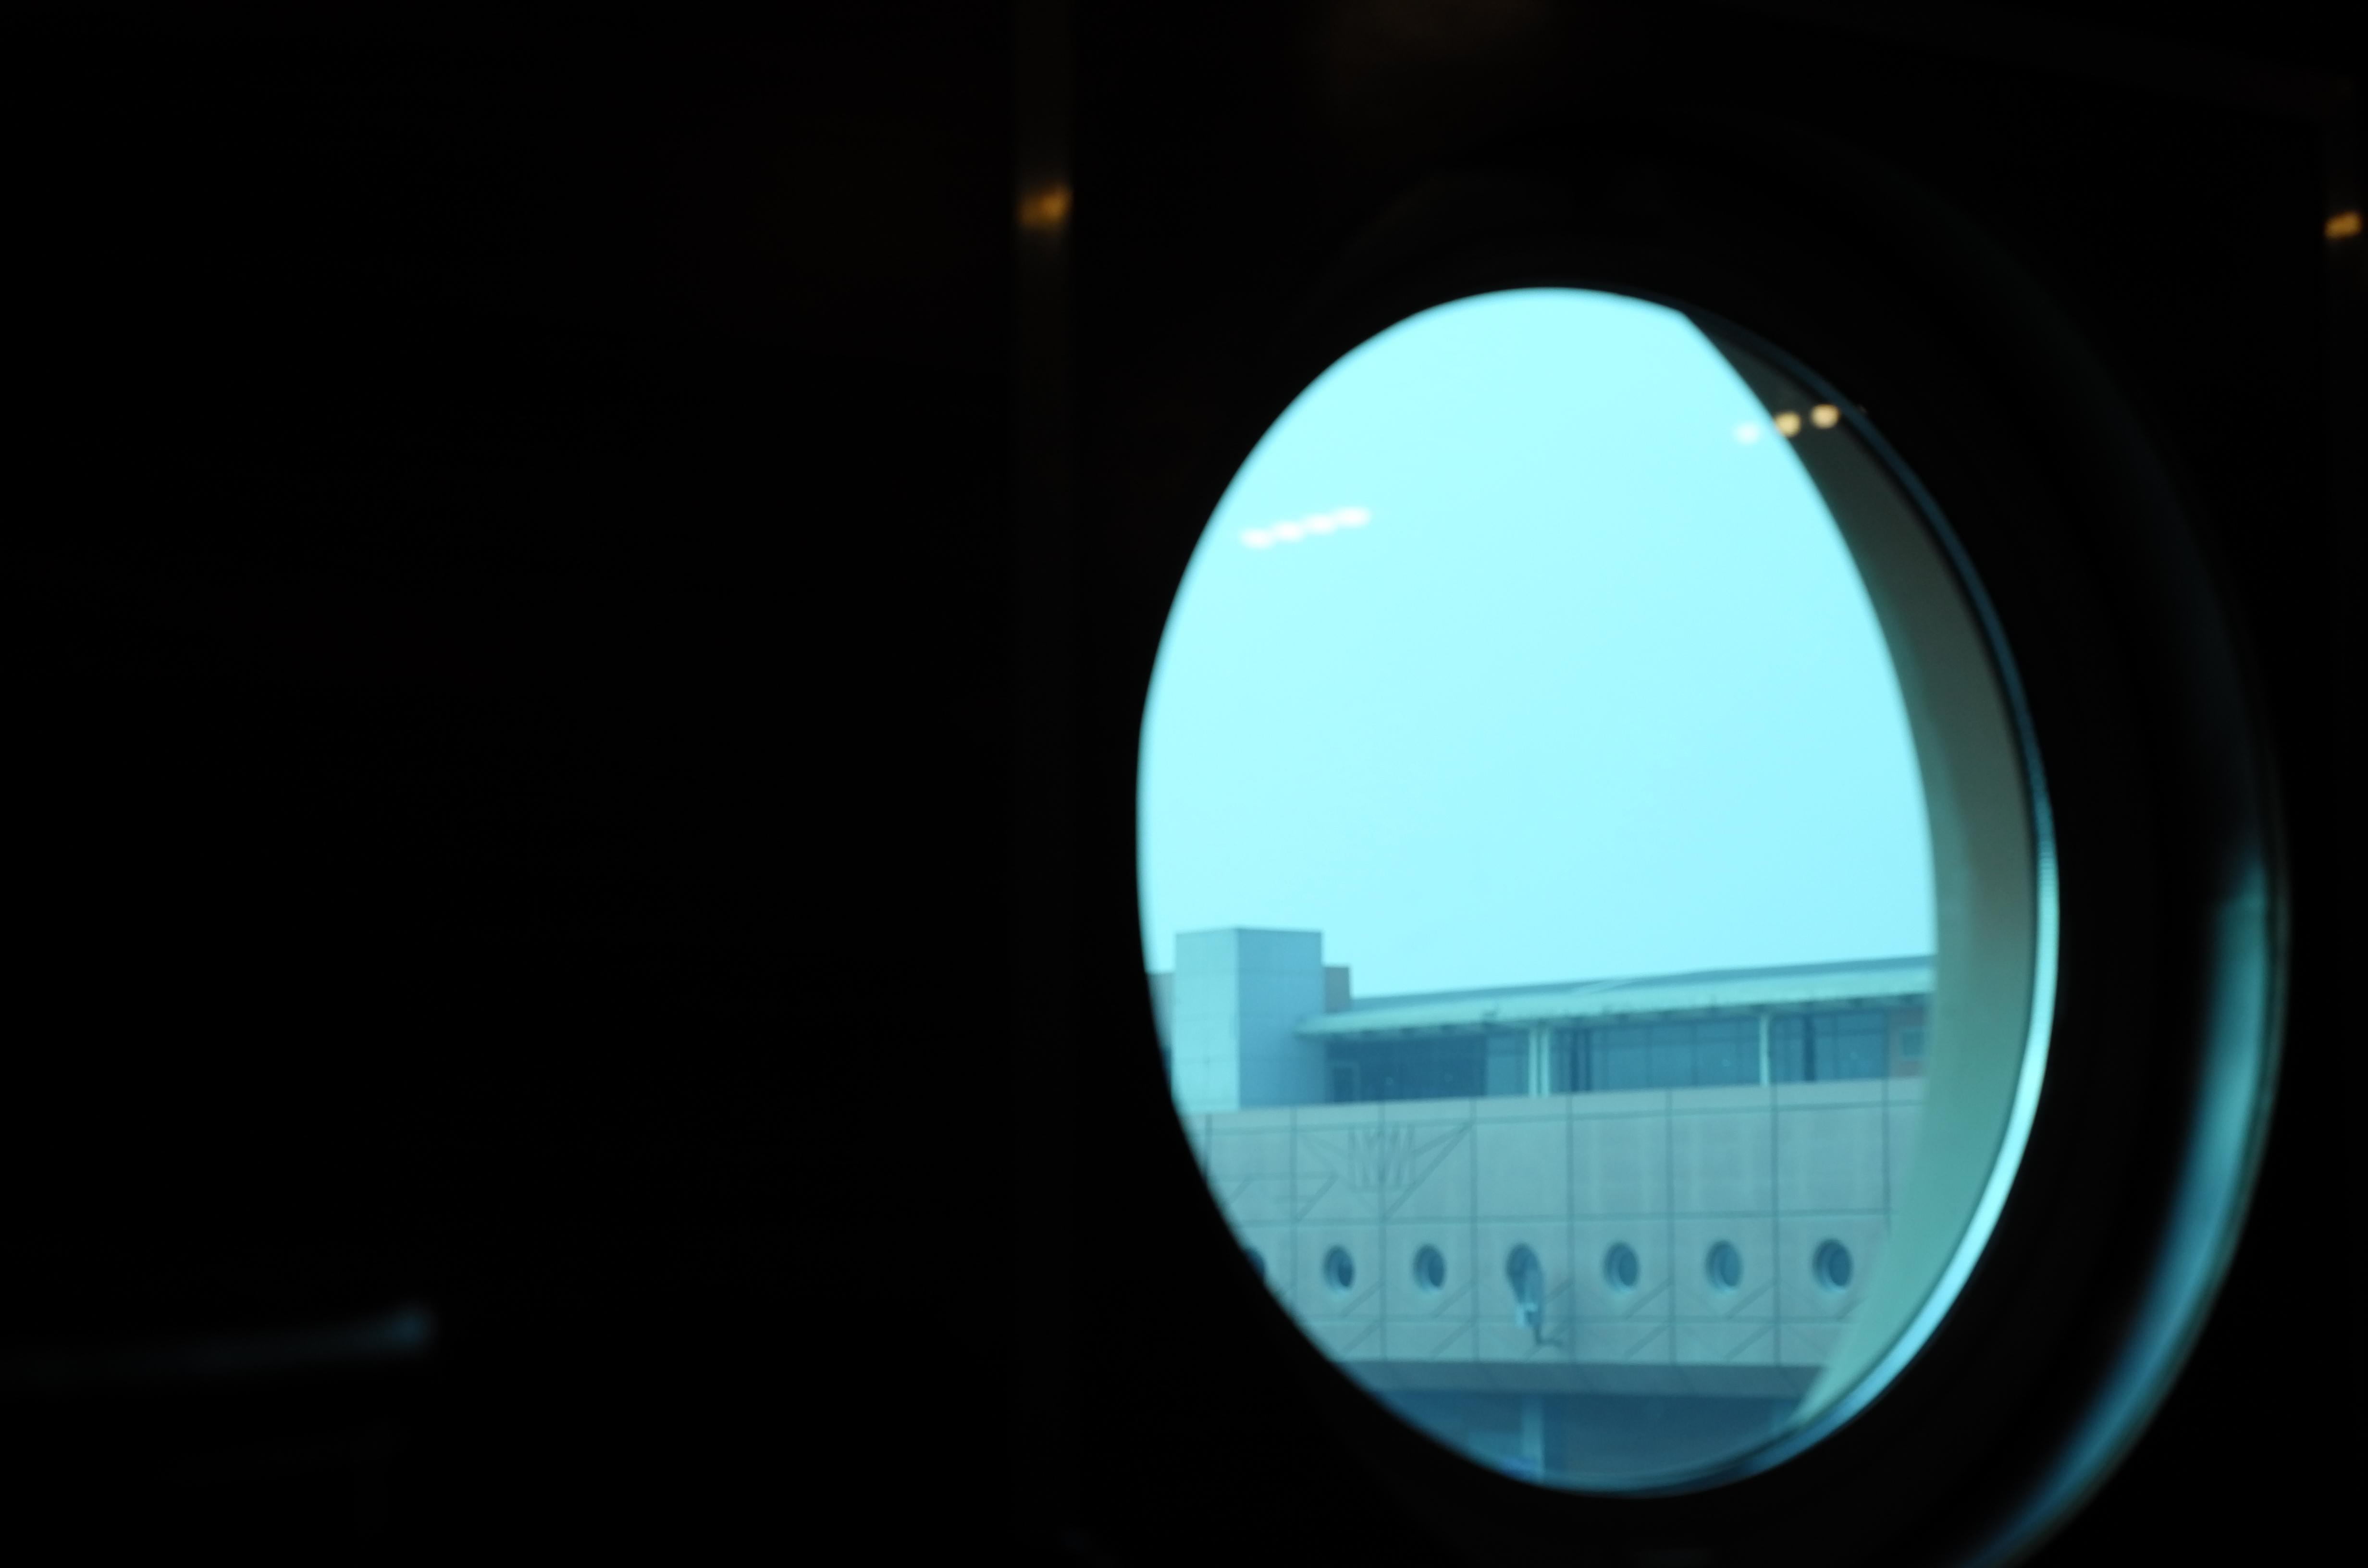 Lounge Review : カイロ空港(CAI) エジプト航空(MS) GIENAHラウンジ